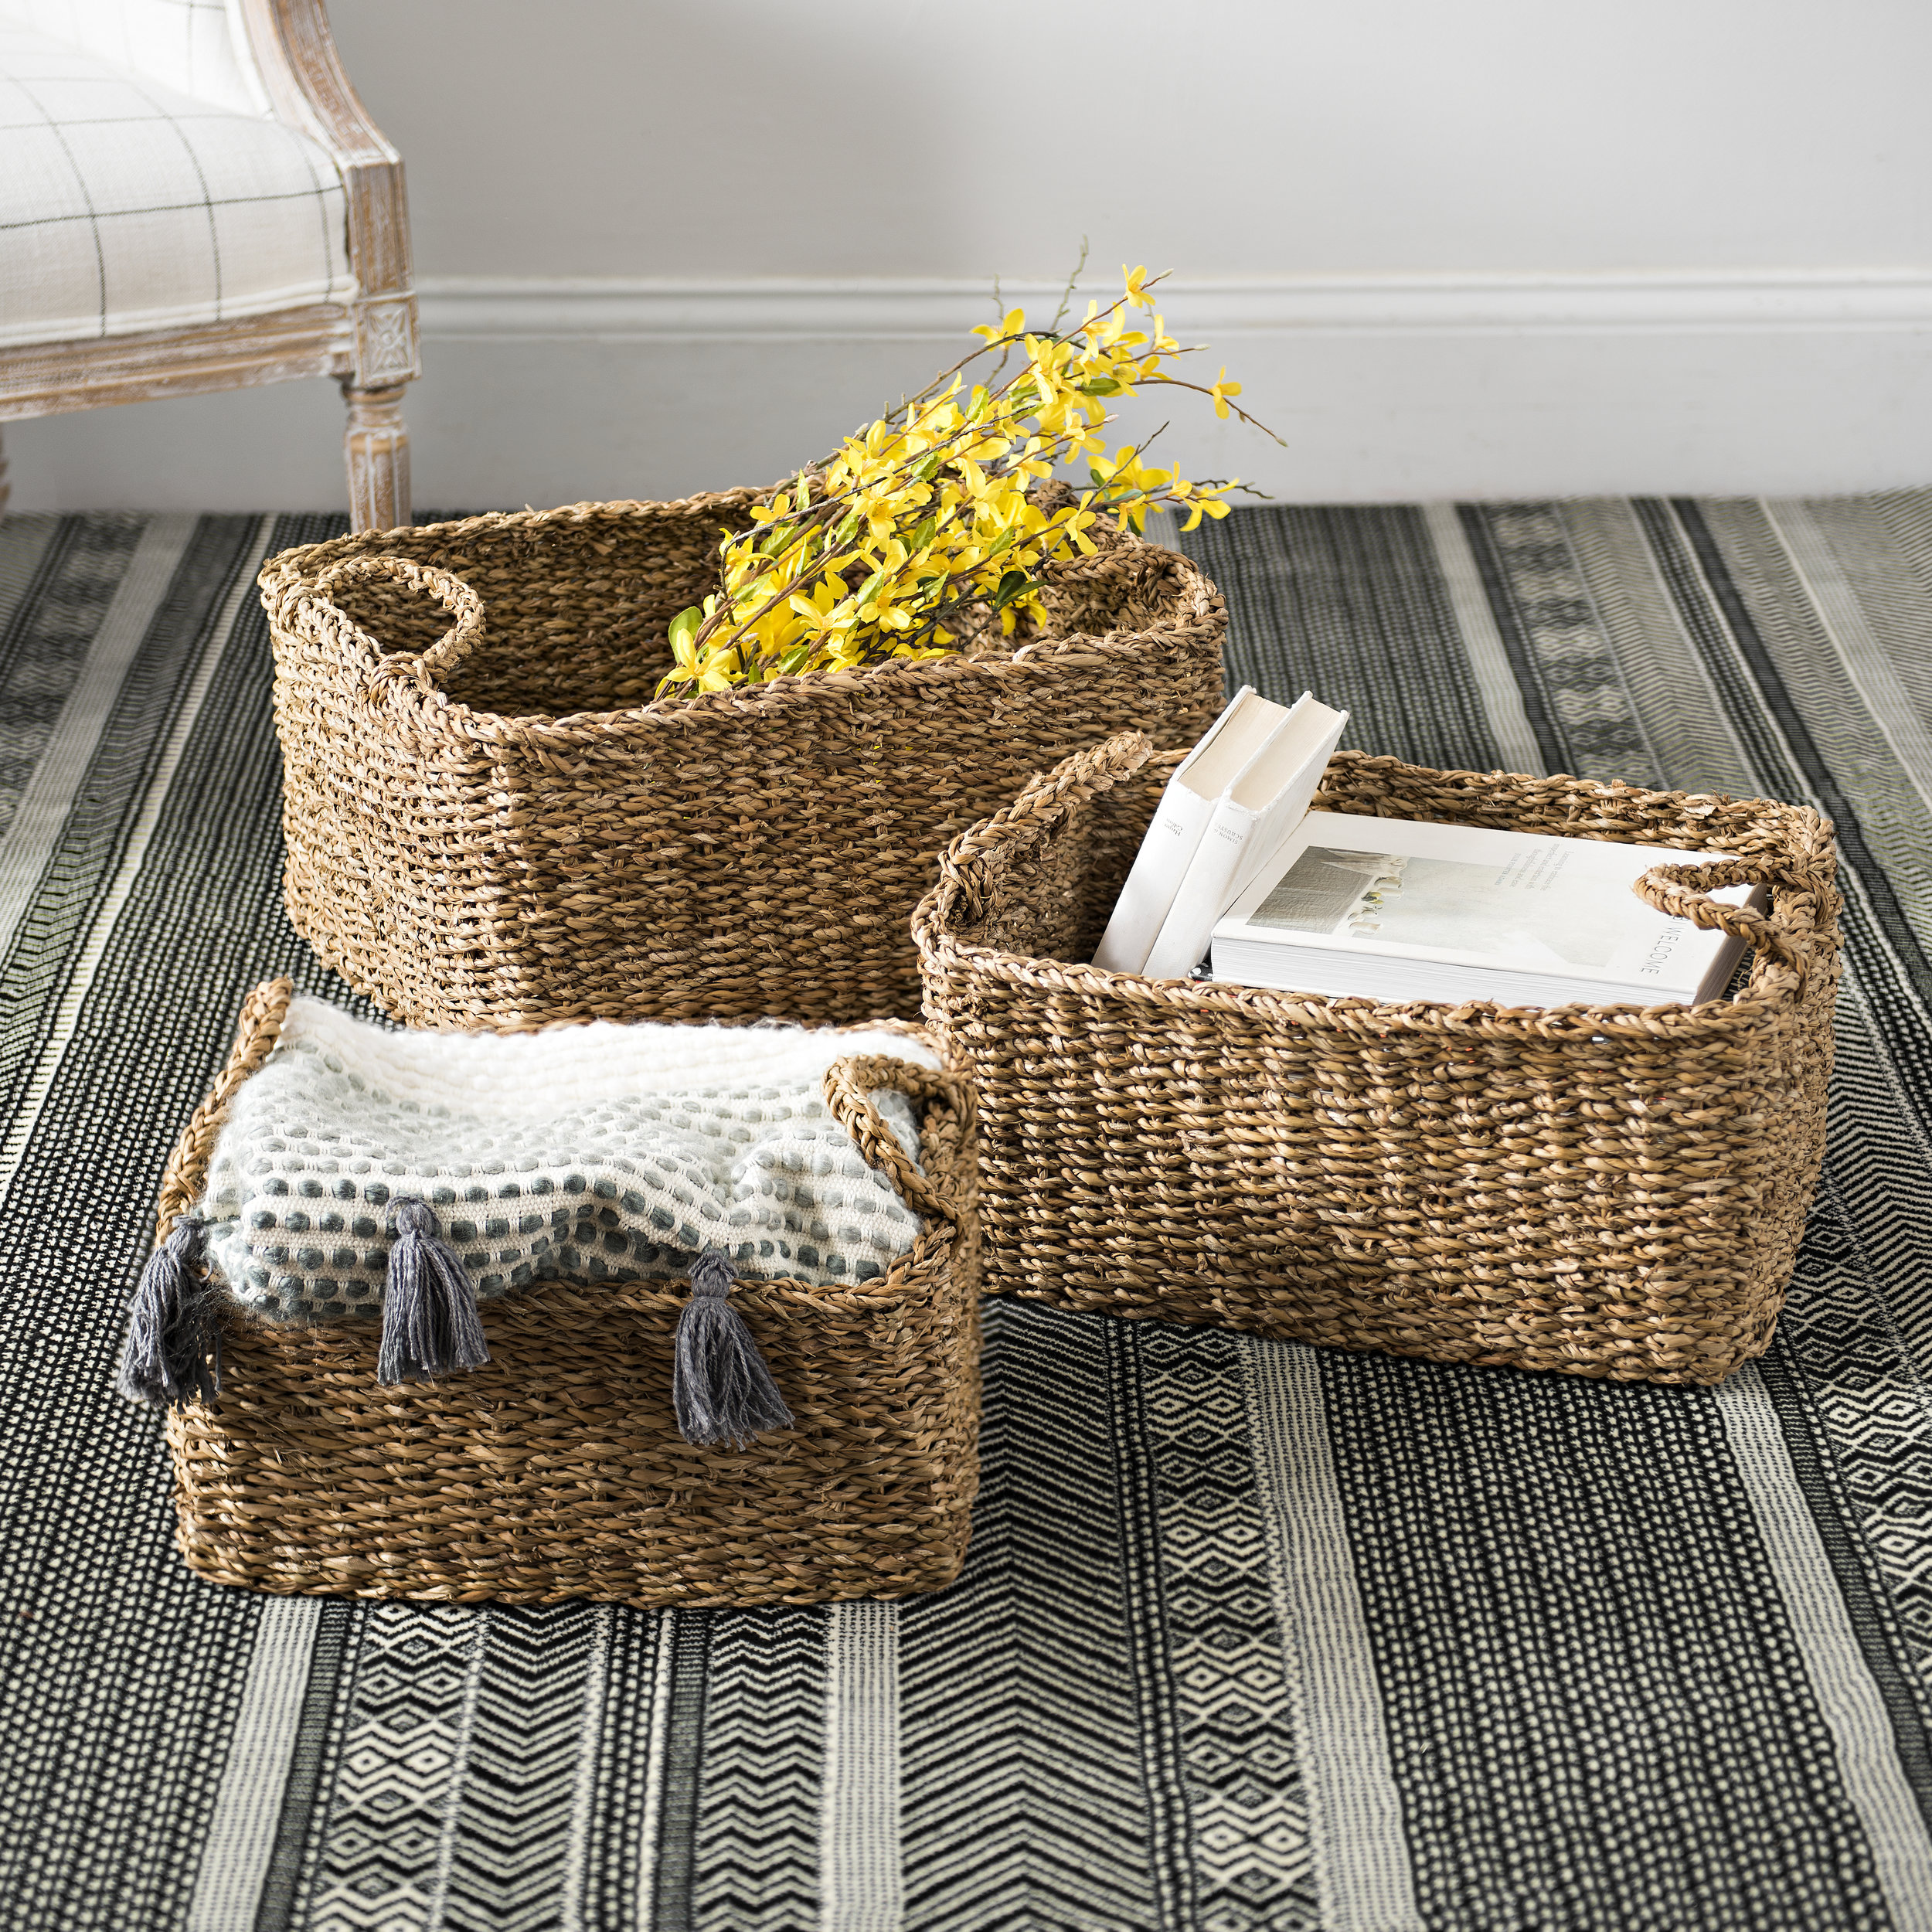 Kirkland's - Woven Storage Baskets